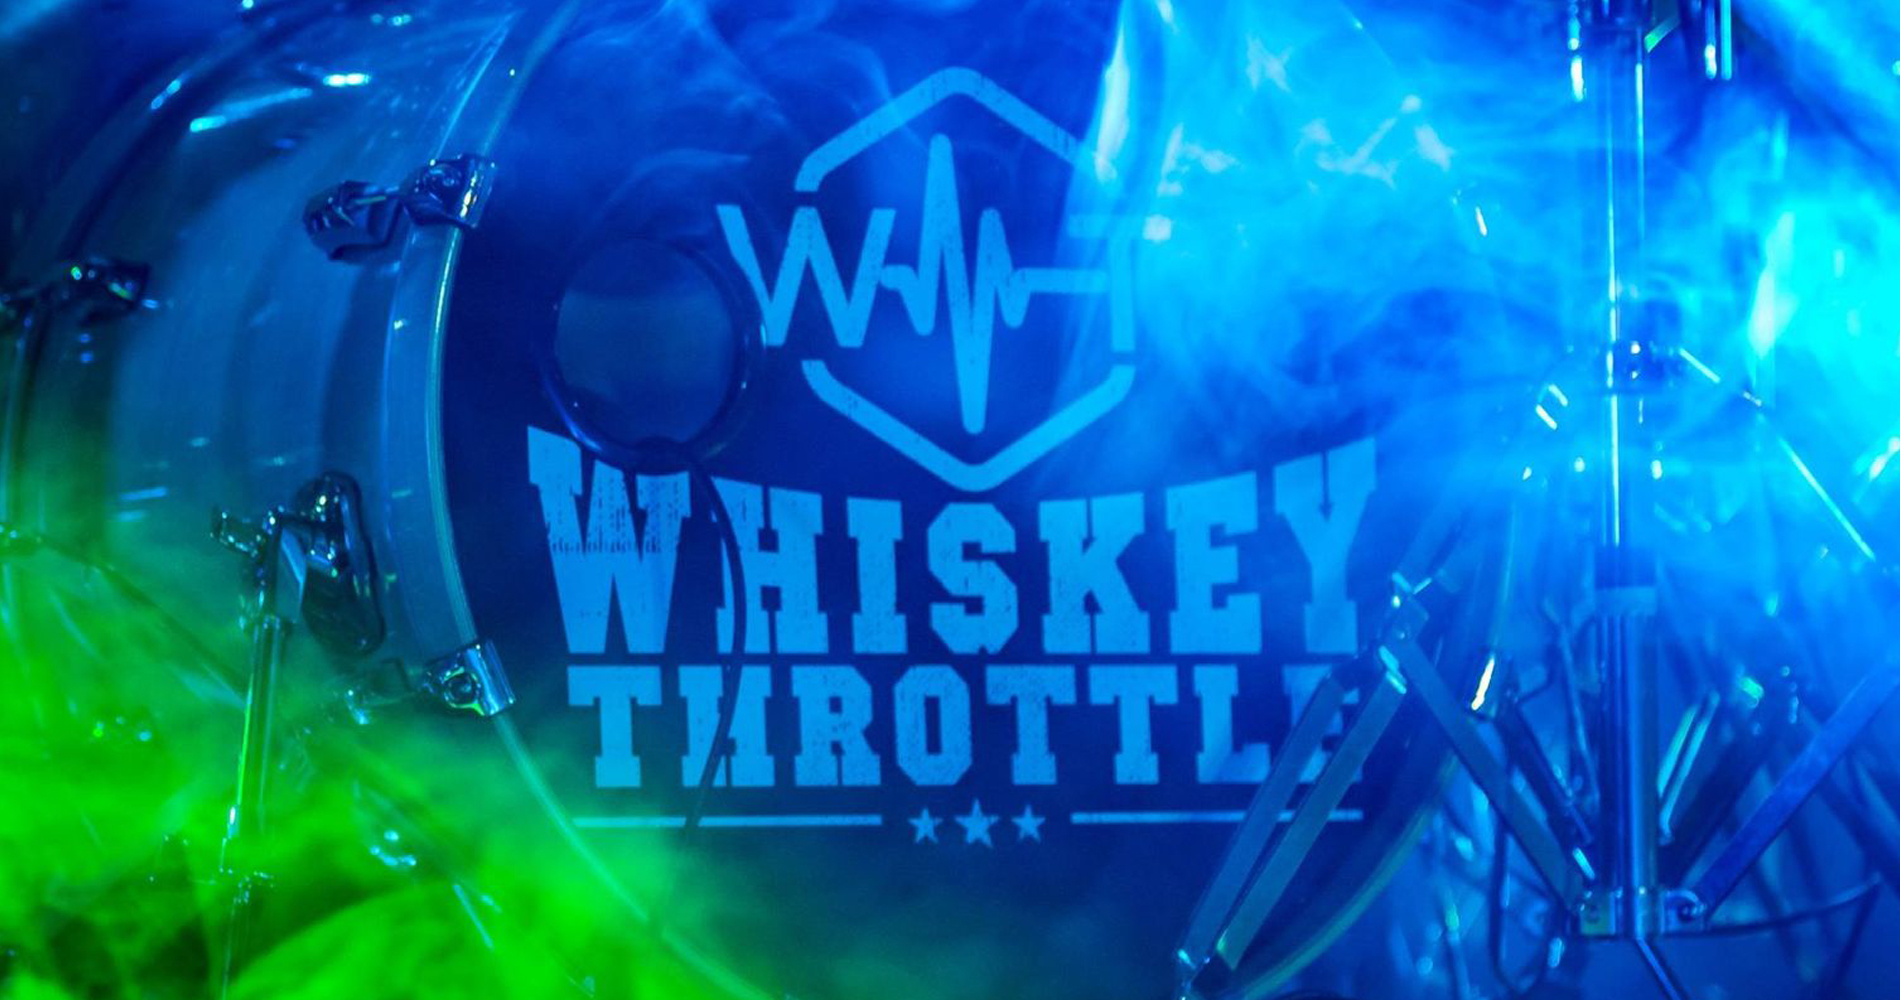 Whiskey Throttle